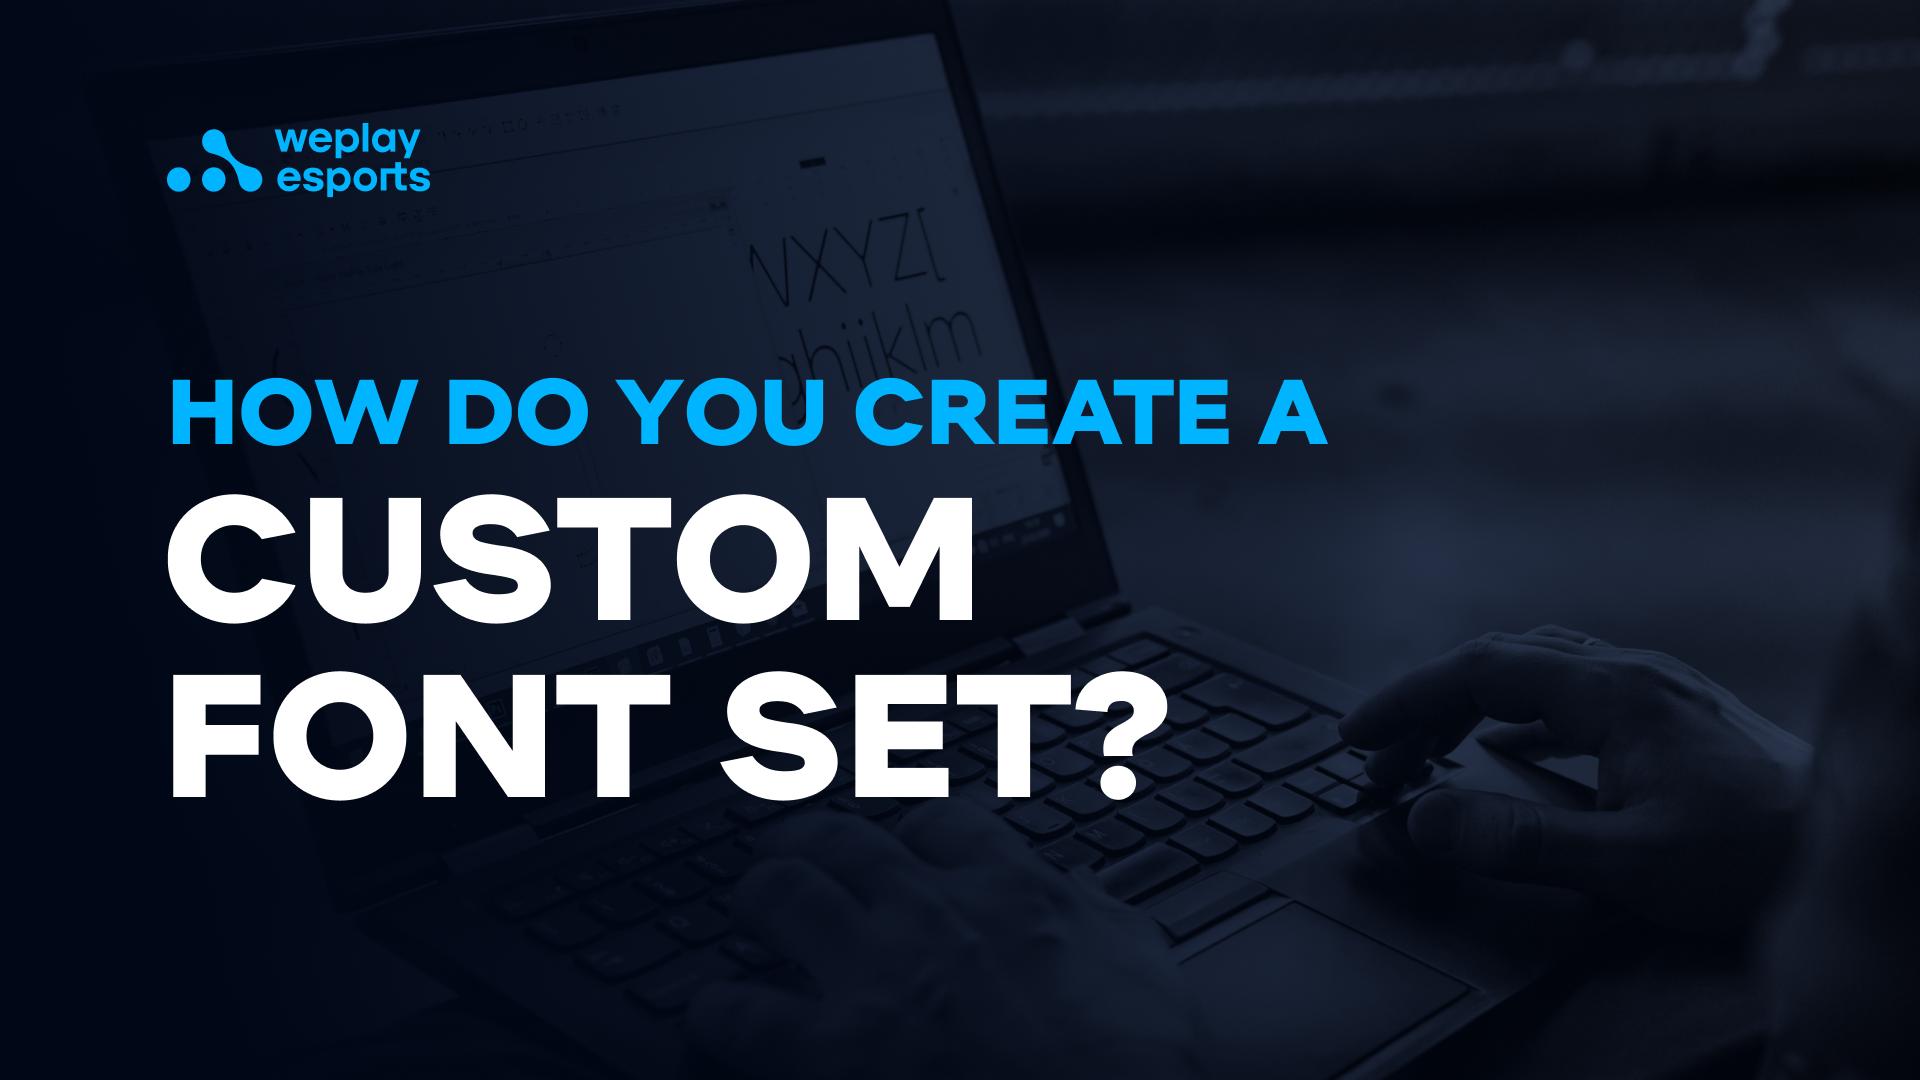 How do you create a custom font set?